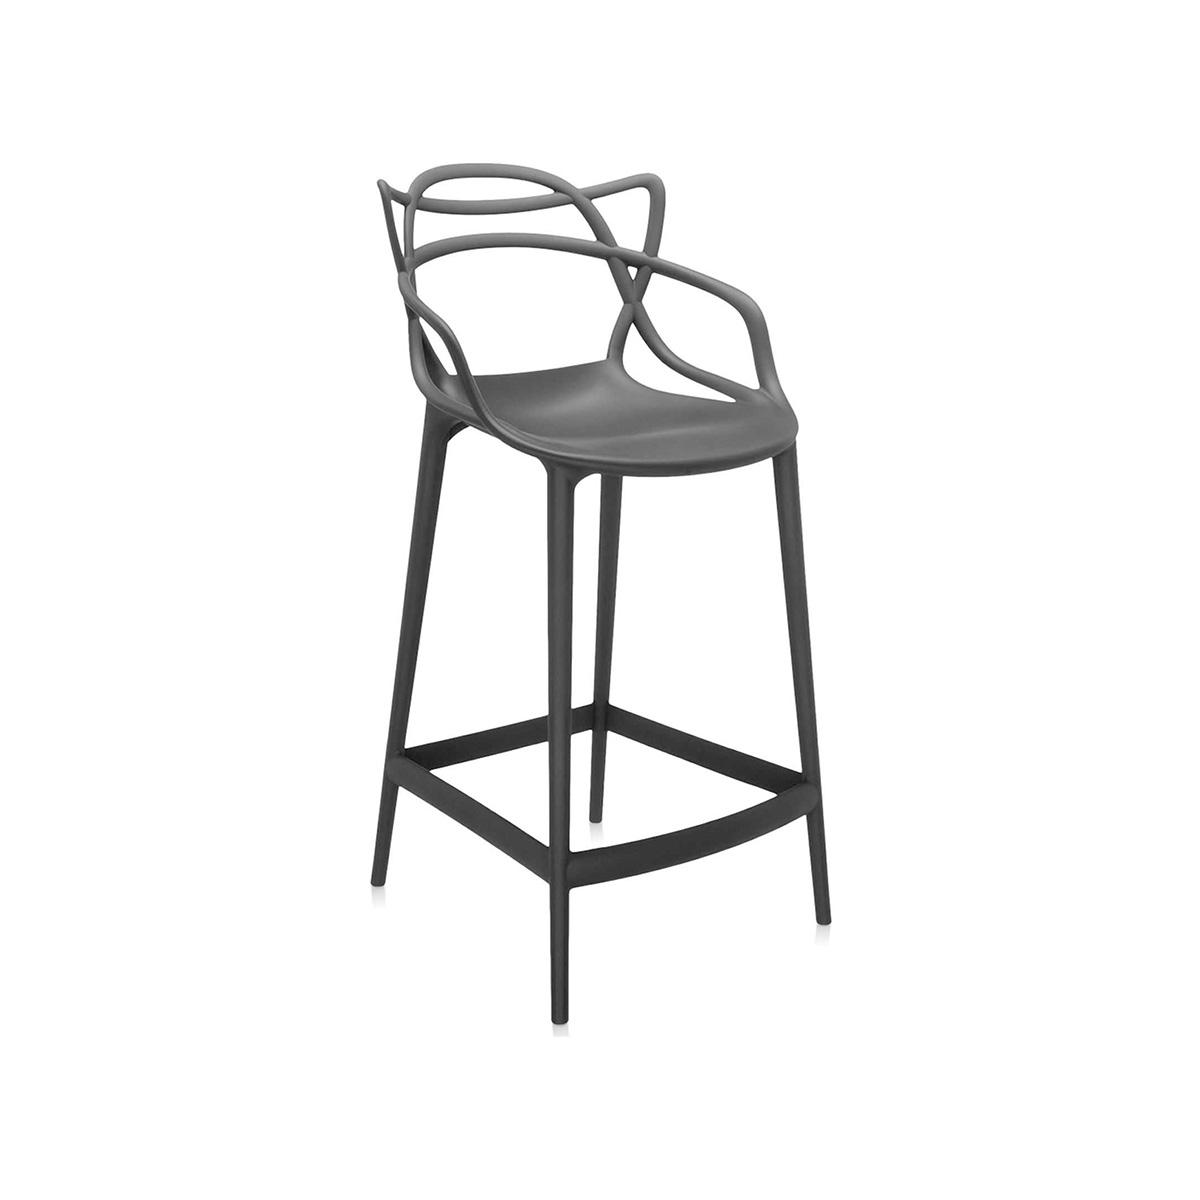 Barska stolica Masters 5869/09 crna